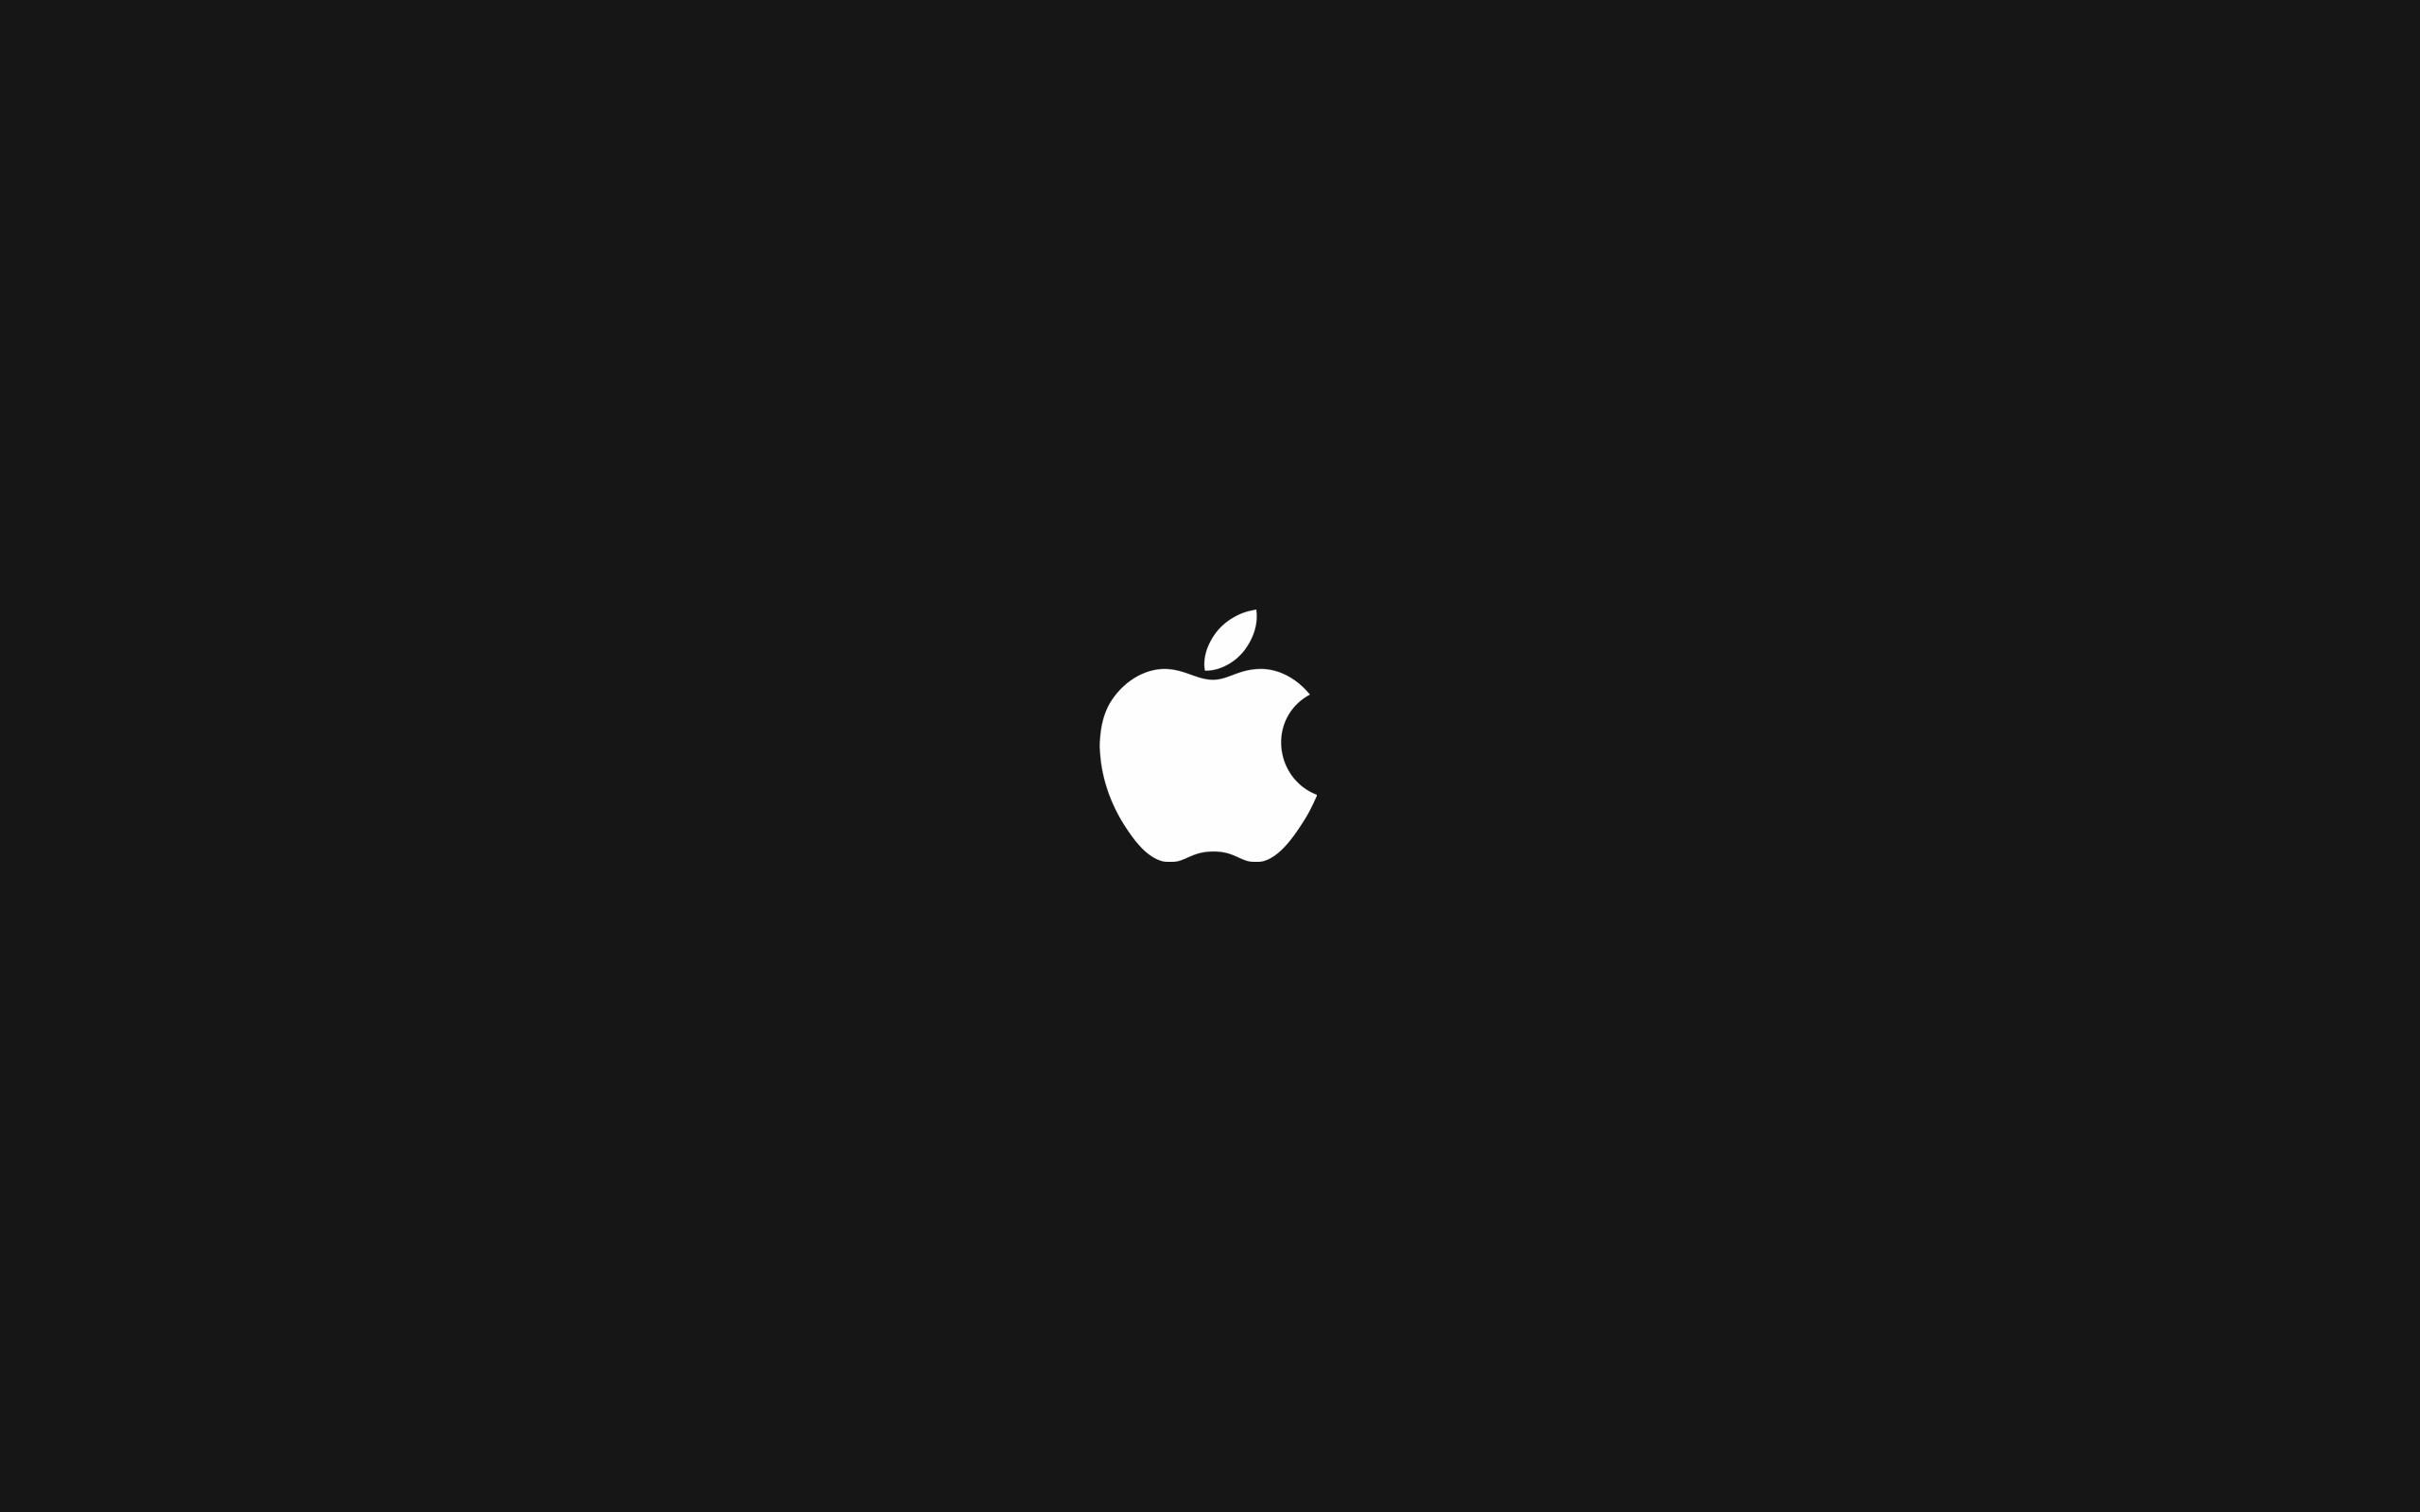 Res: 2560x1600,  Bild: Apple-Logo (schwarz) wallpapers and stock photos. Â«